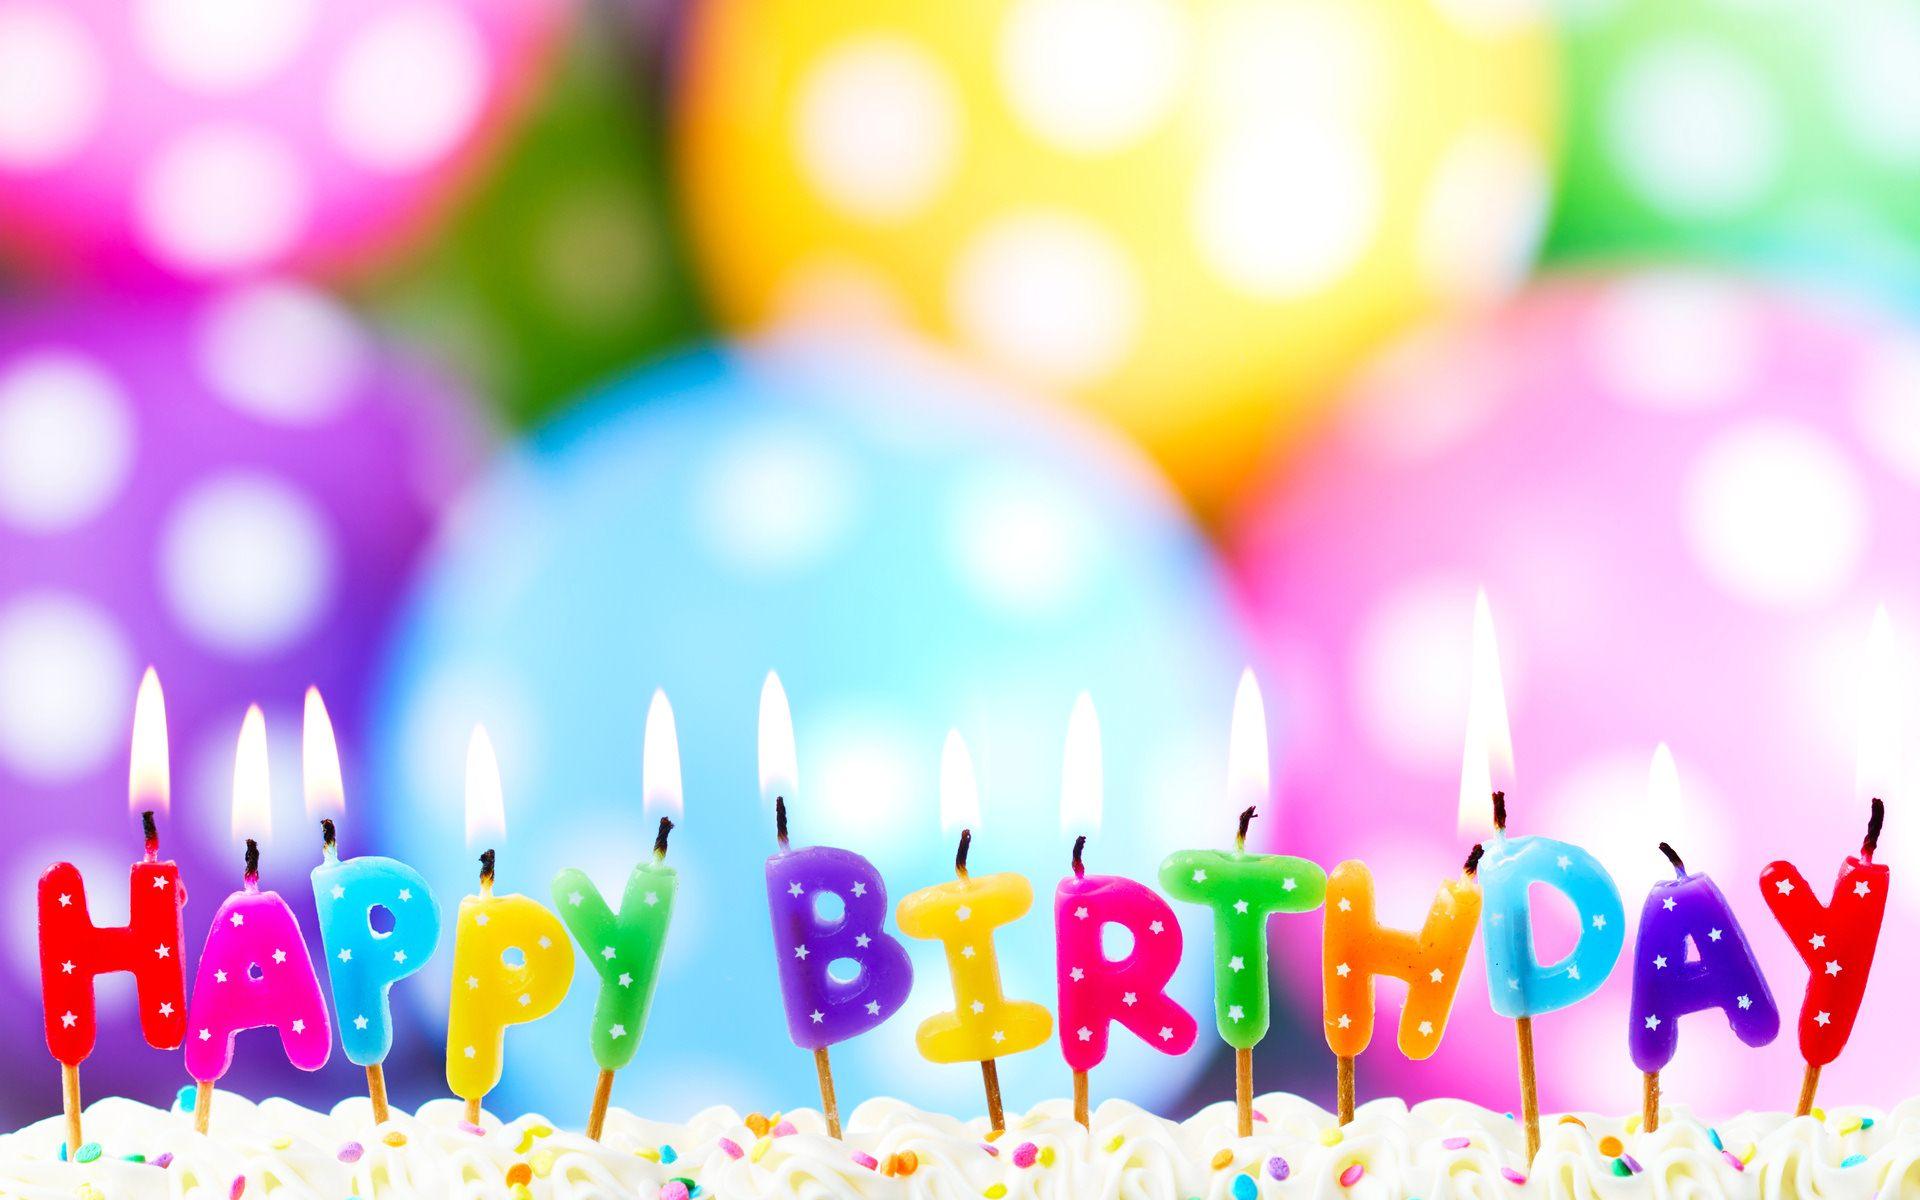 Happy Birthday Desktop Wallpaper Images amp Pictures   Becuo 1920x1200